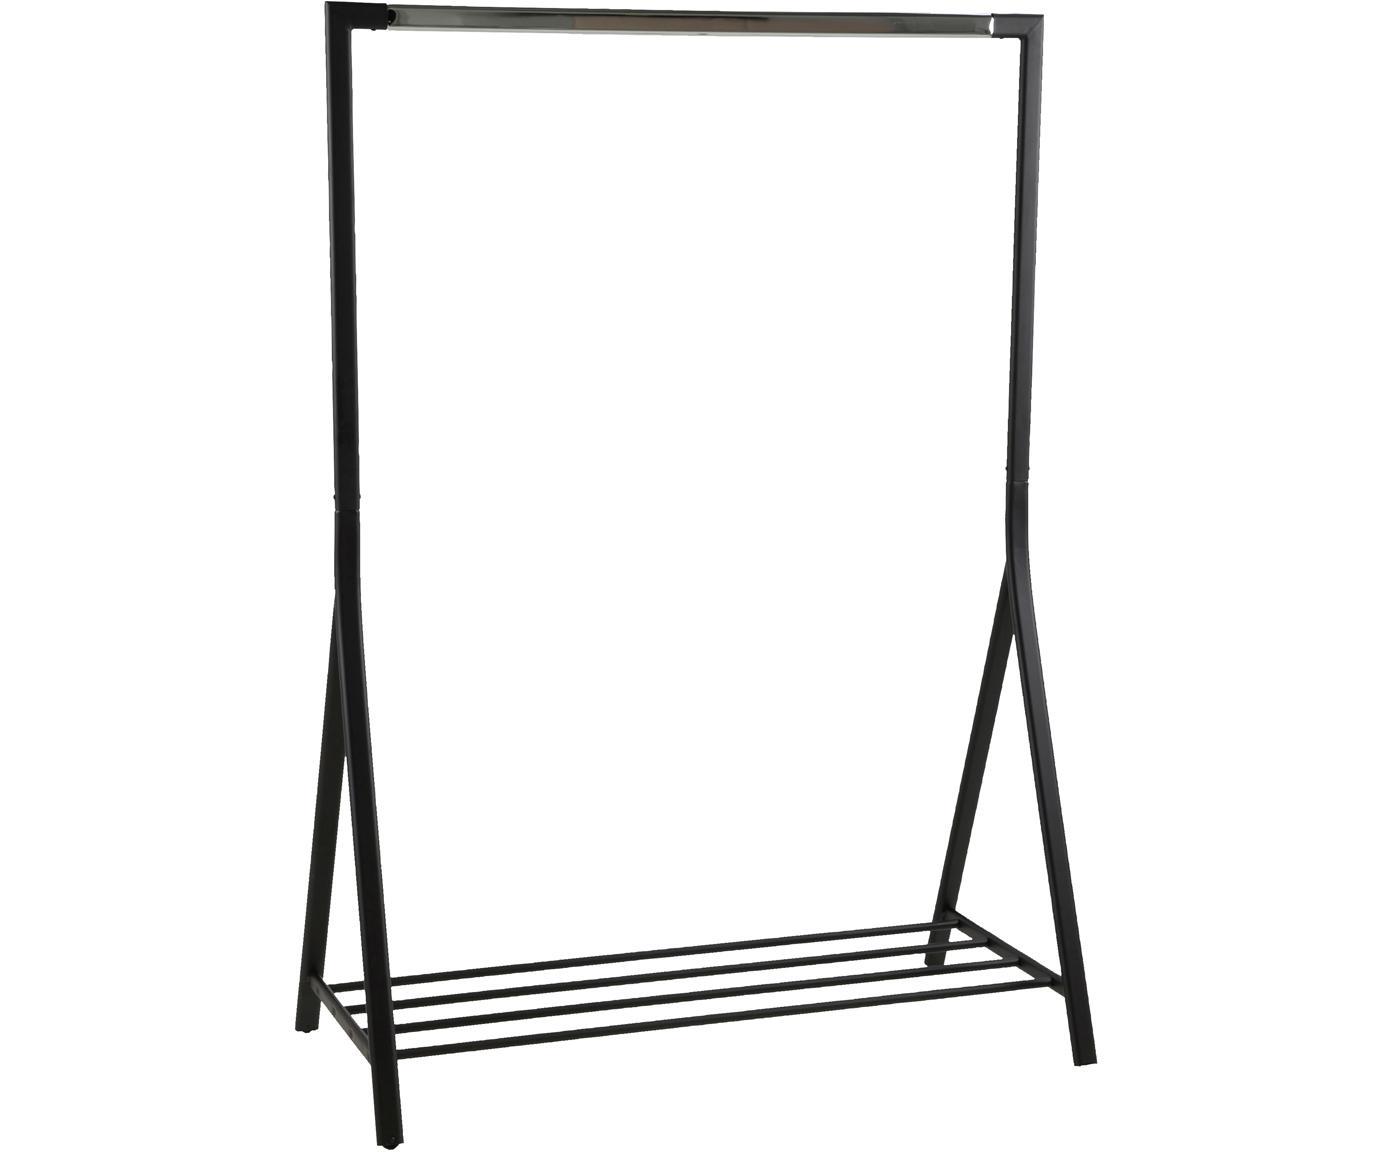 Burro de metal Brent, Metal con pintura en polvo, Negro, An 117 x F 59 cm